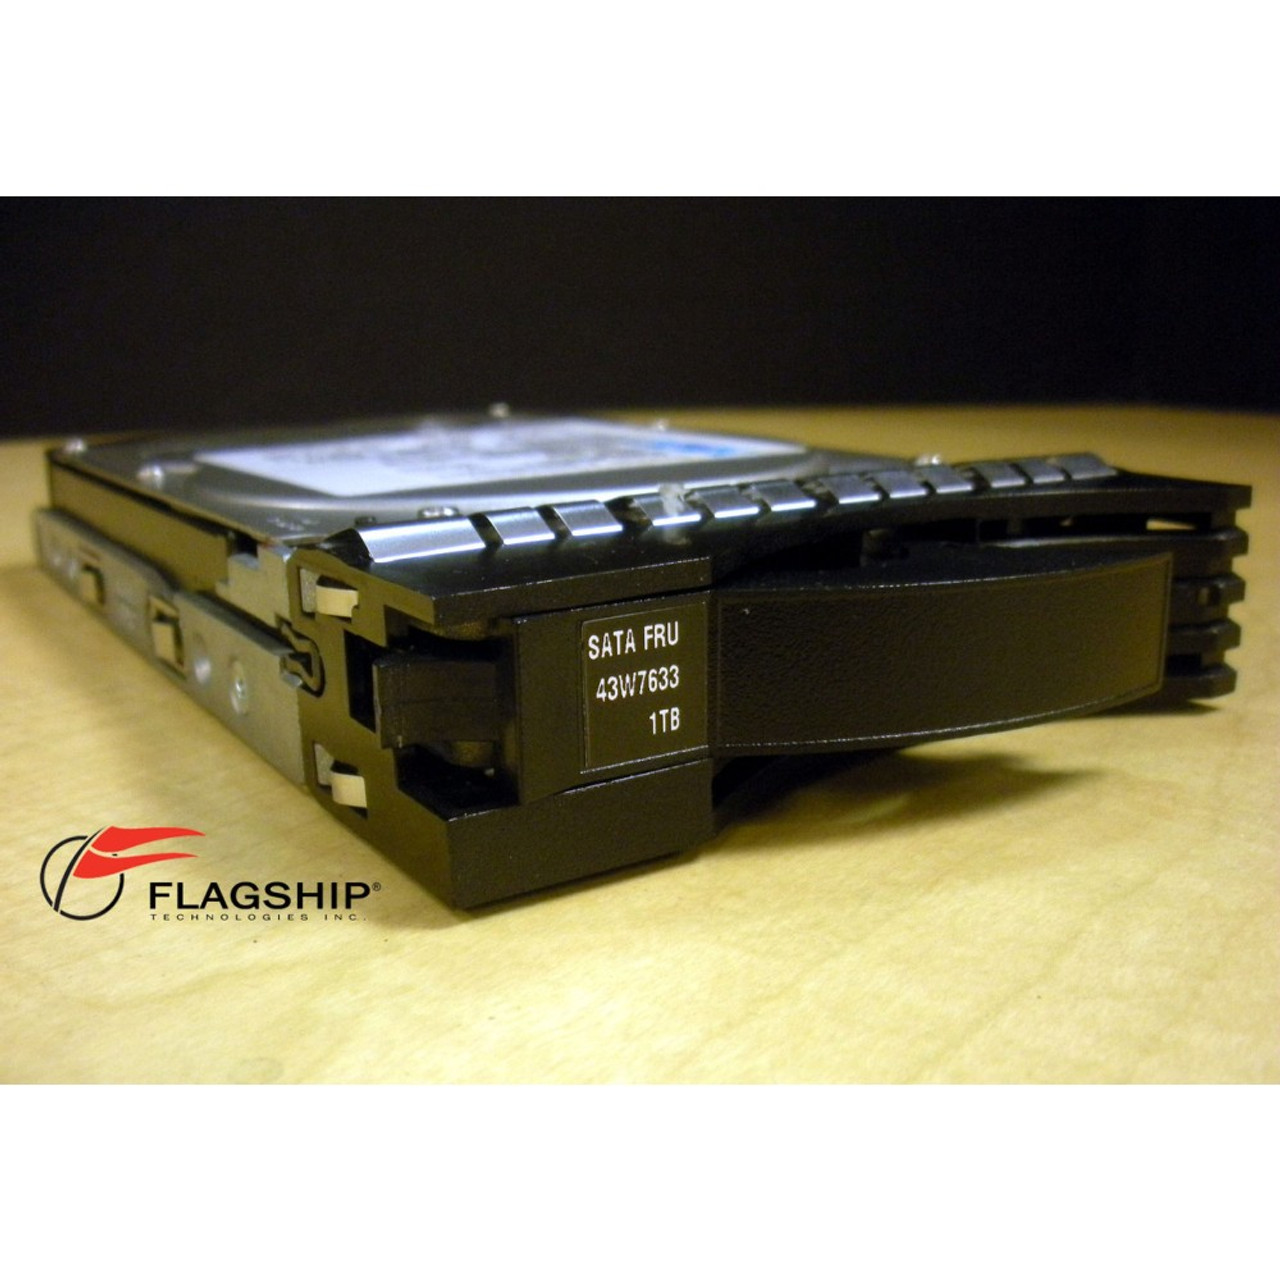 43W7630 IBM 1 TB 3.5 Internal Hard Drive